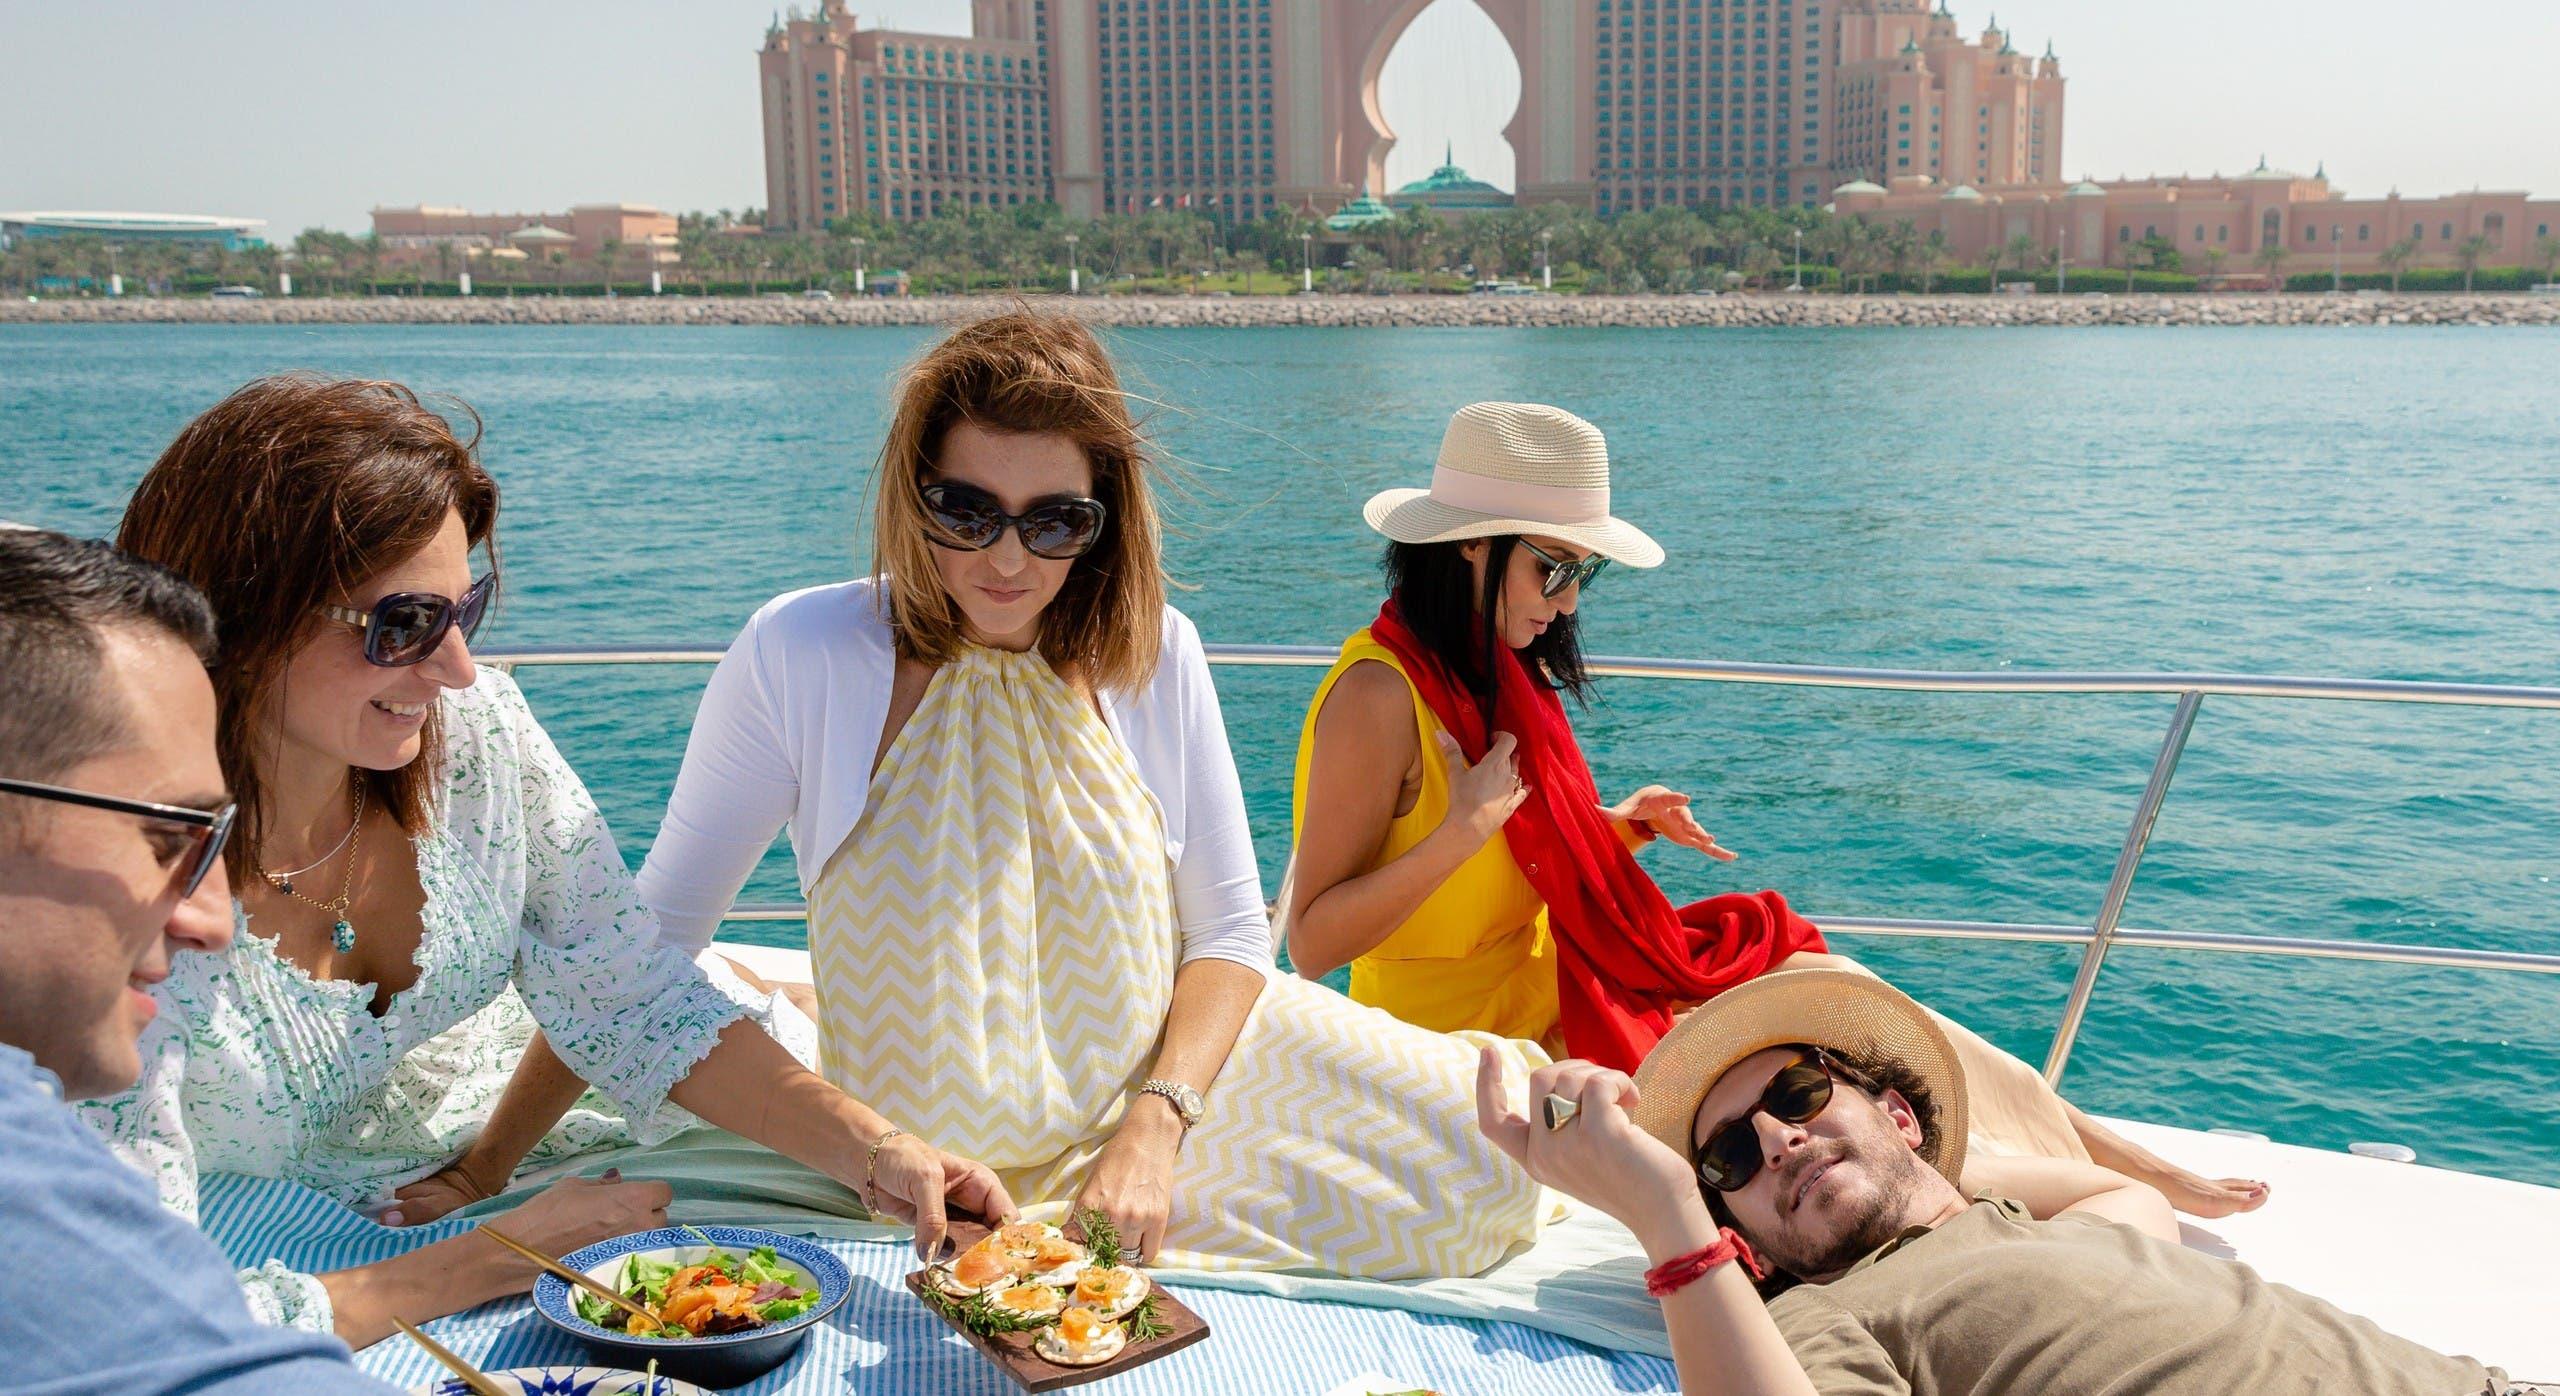 Elli Kriel, founder of Dubai-based Elli's Kosher Kitchen, samples some of her dishes with friends in Dubai. (Courtesy: Elli Kriel)